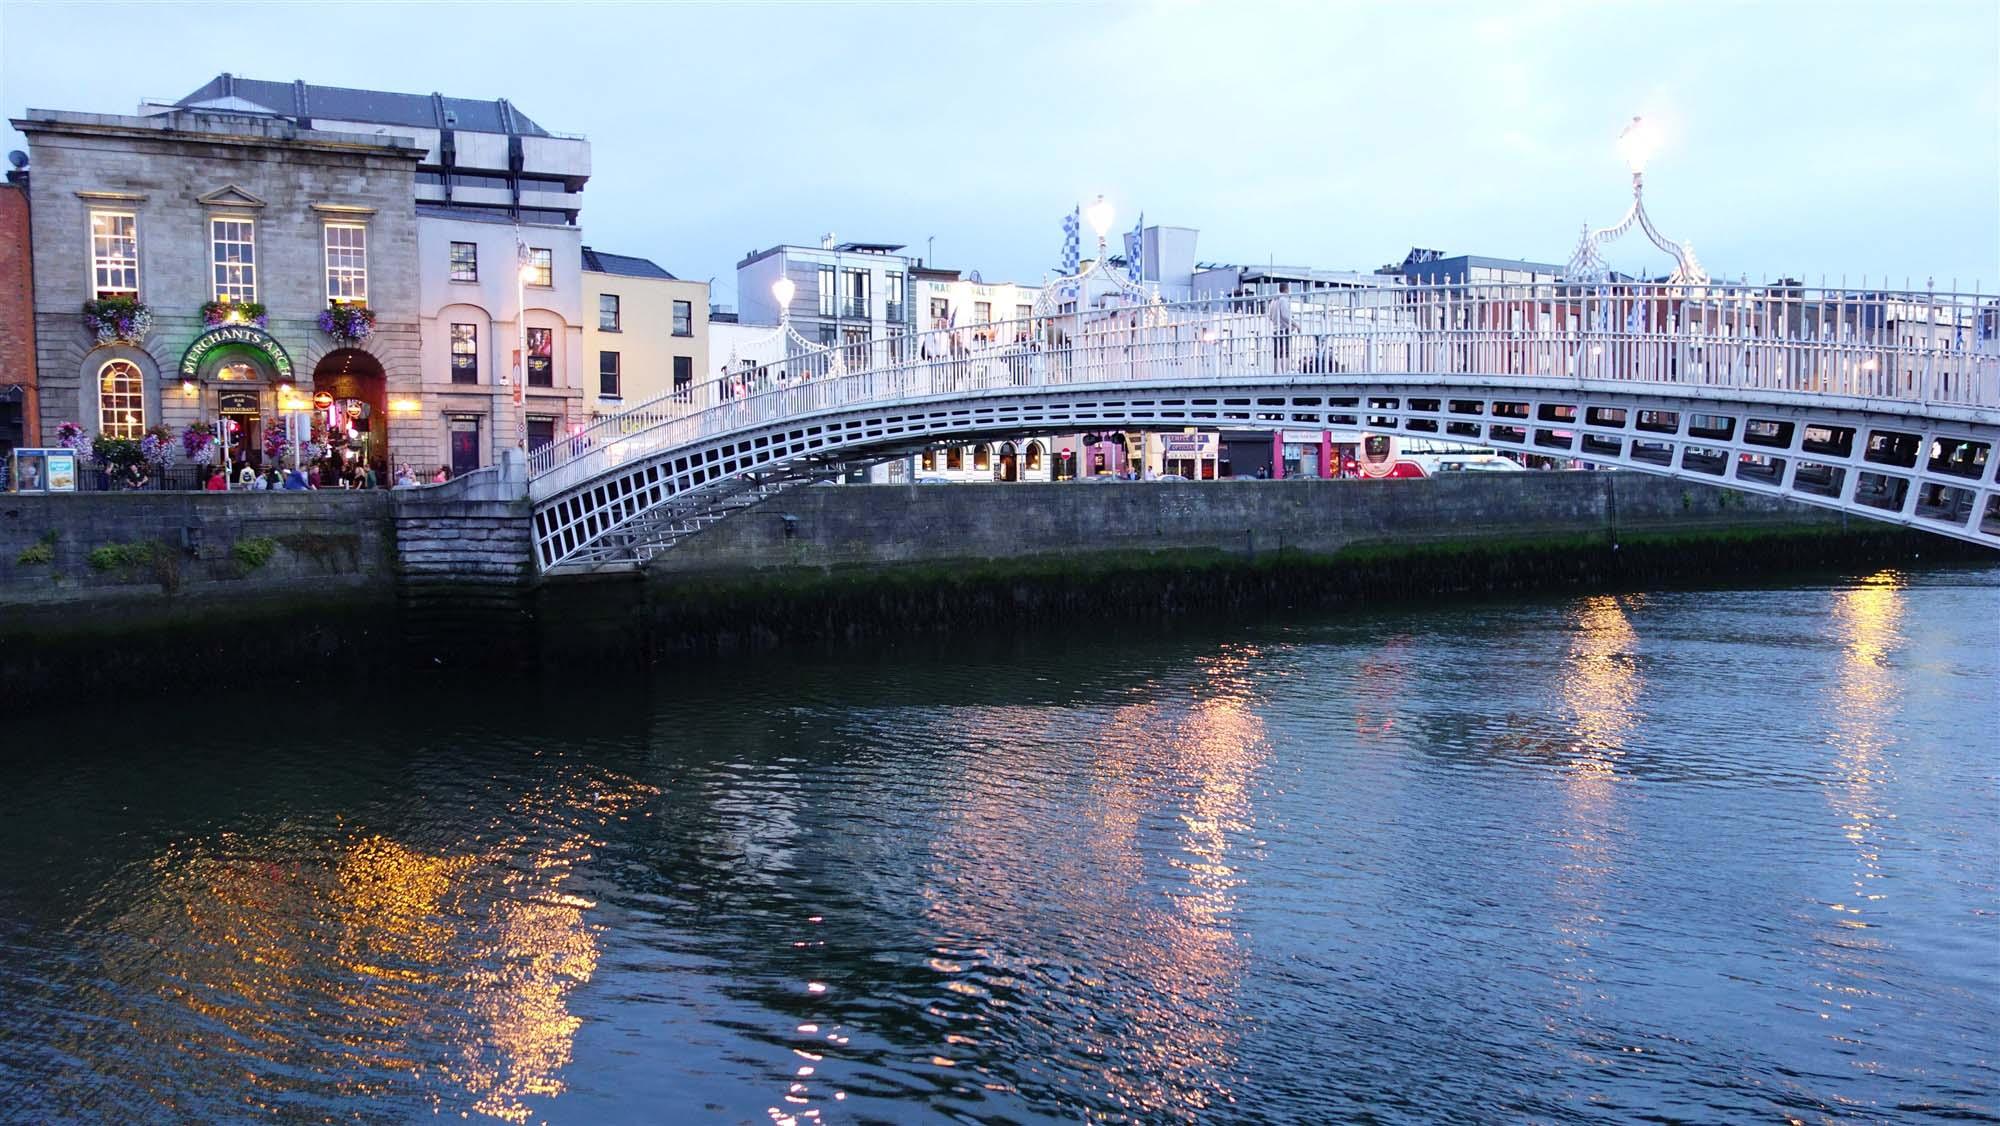 Halfpenny Bridge